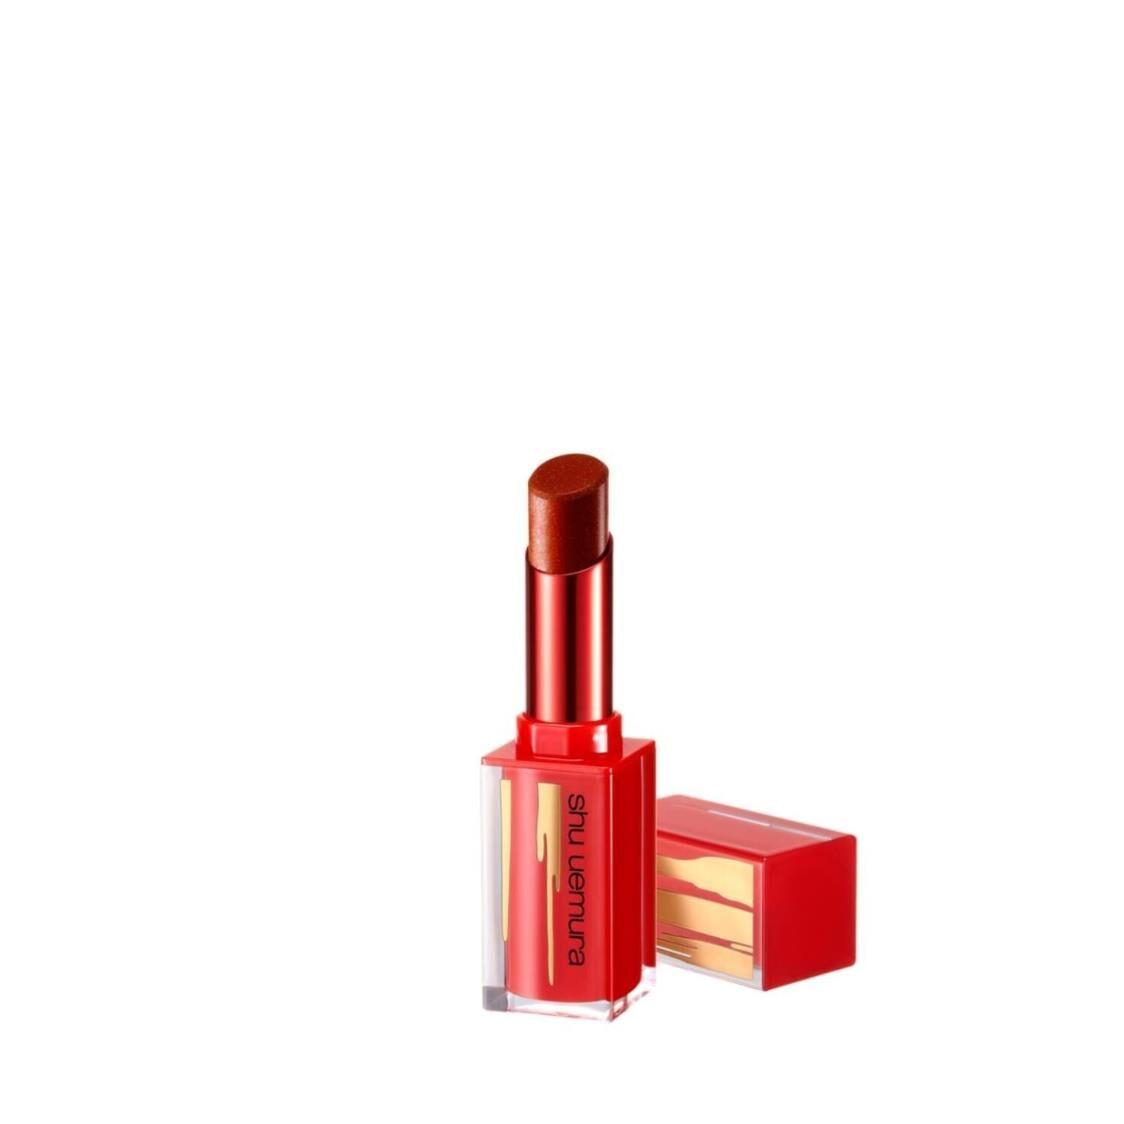 Shu Uemura Iron Reds Rouge Unlimited Matte Metallic